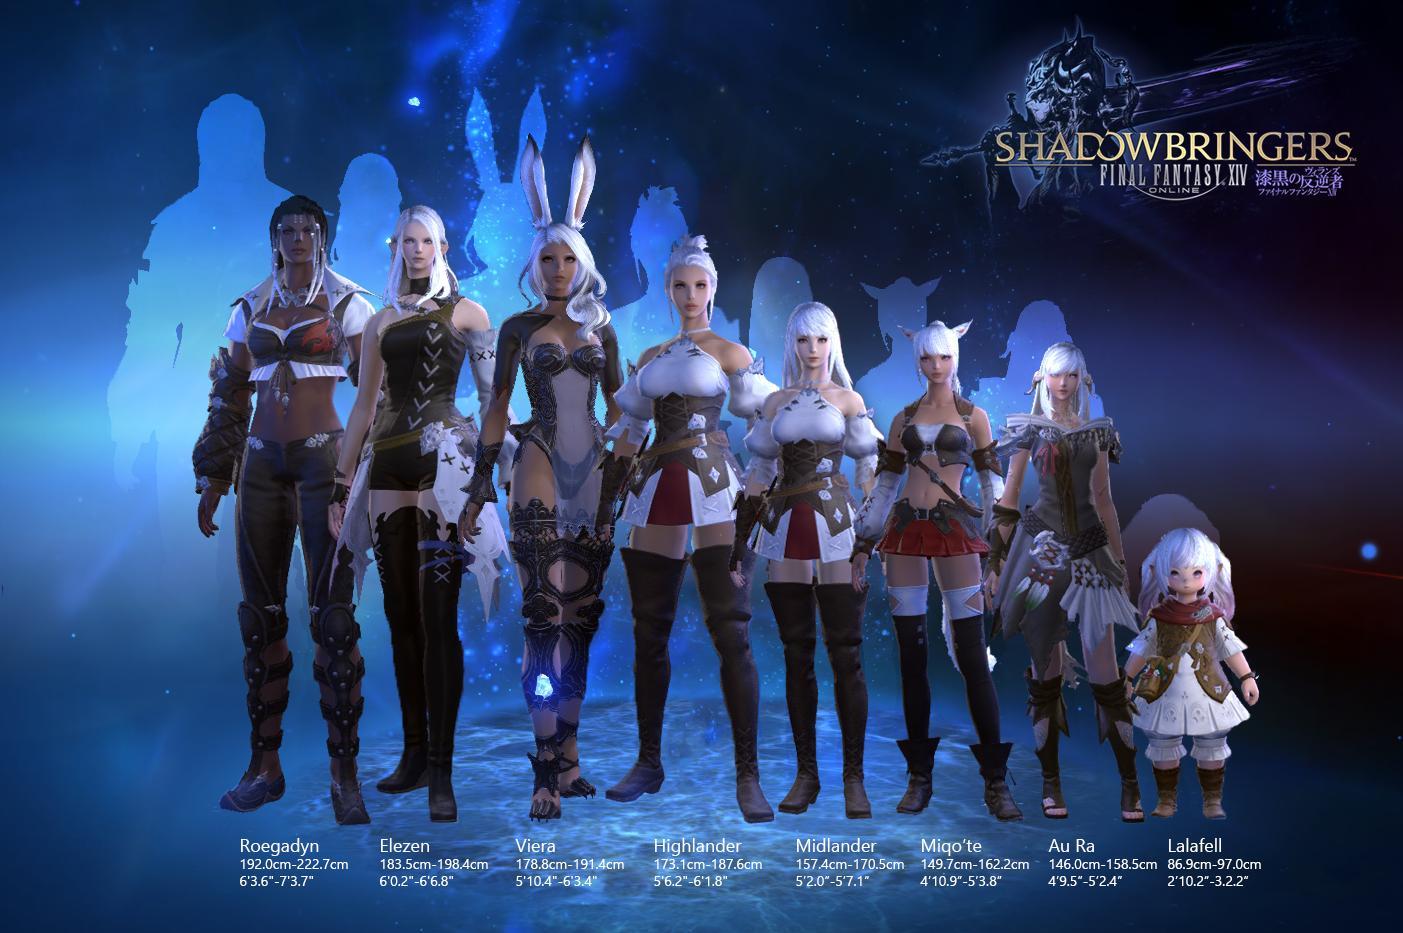 Final Fantasy XIV: Shadowbringers (2019)